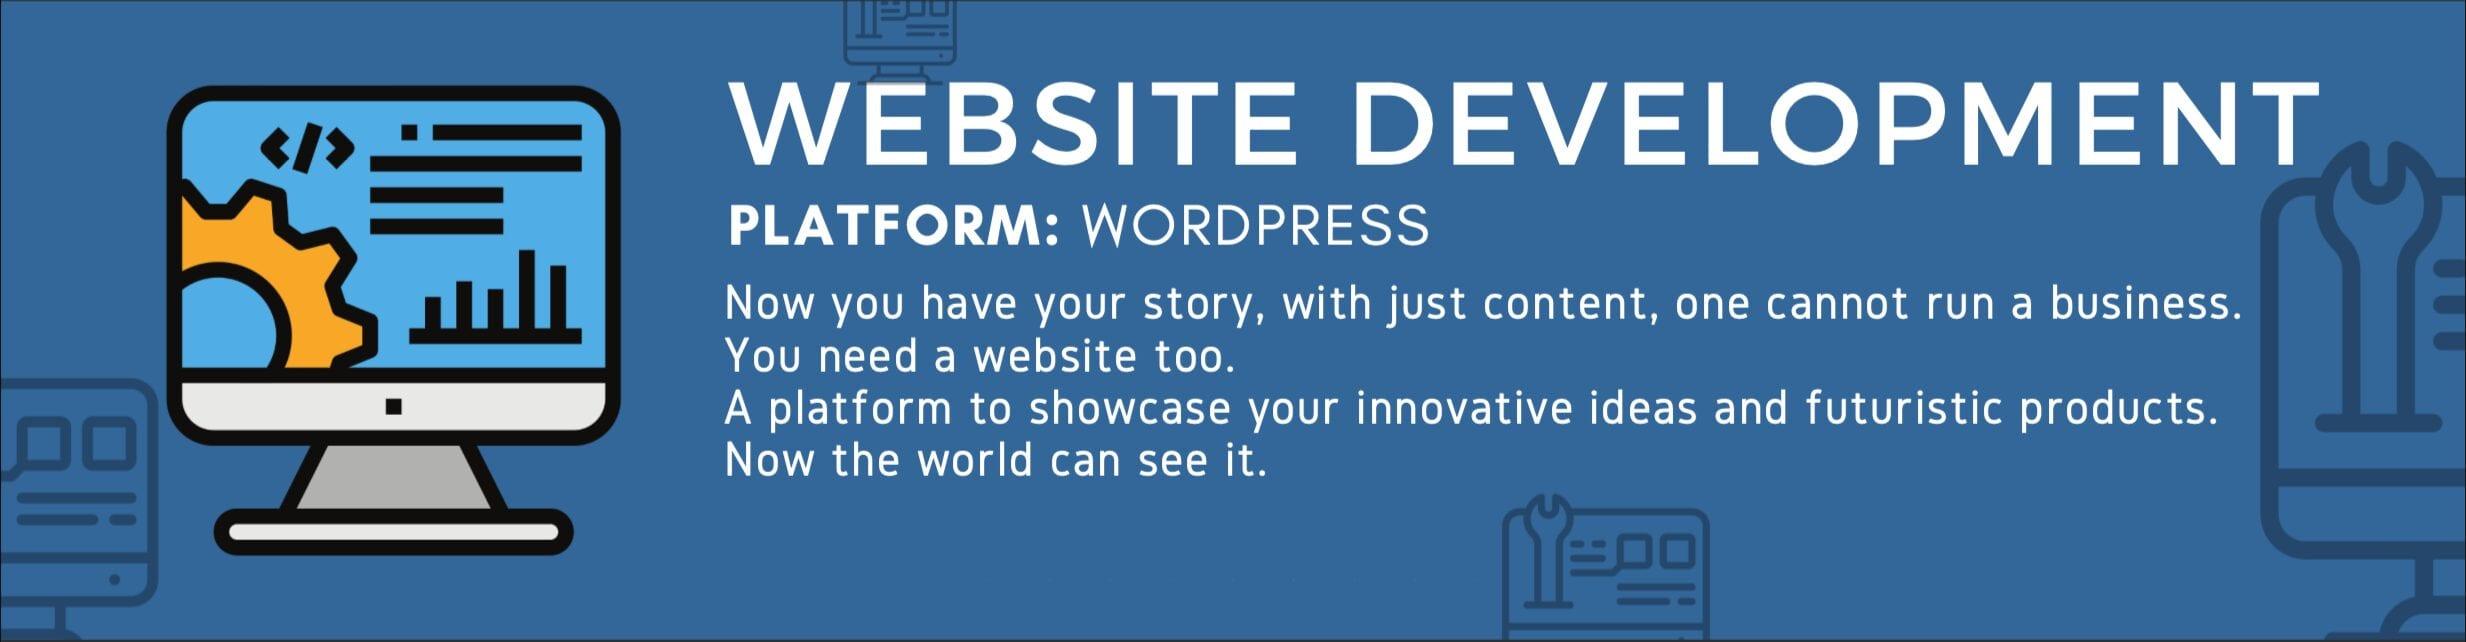 Website Development Description